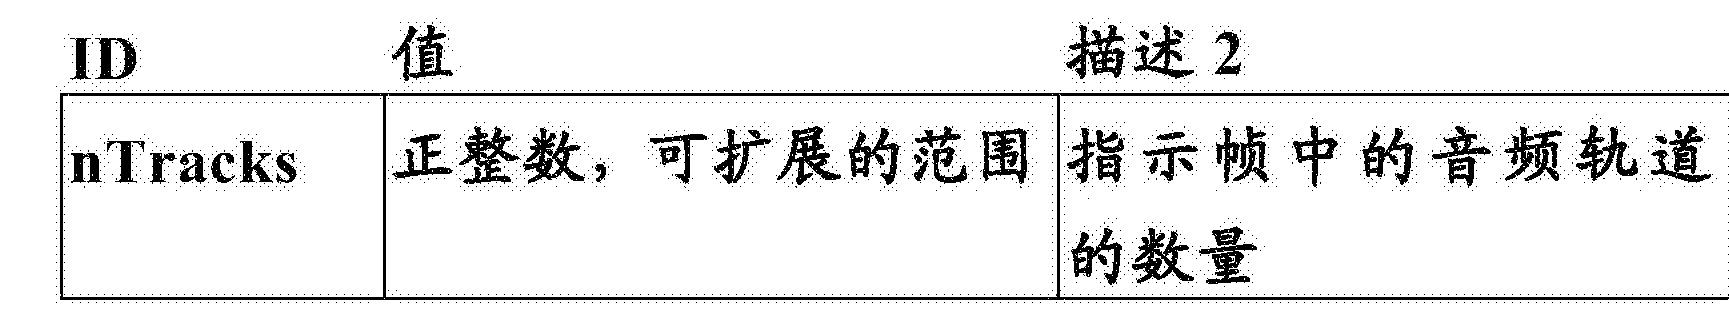 Figure CN105792086AD00232